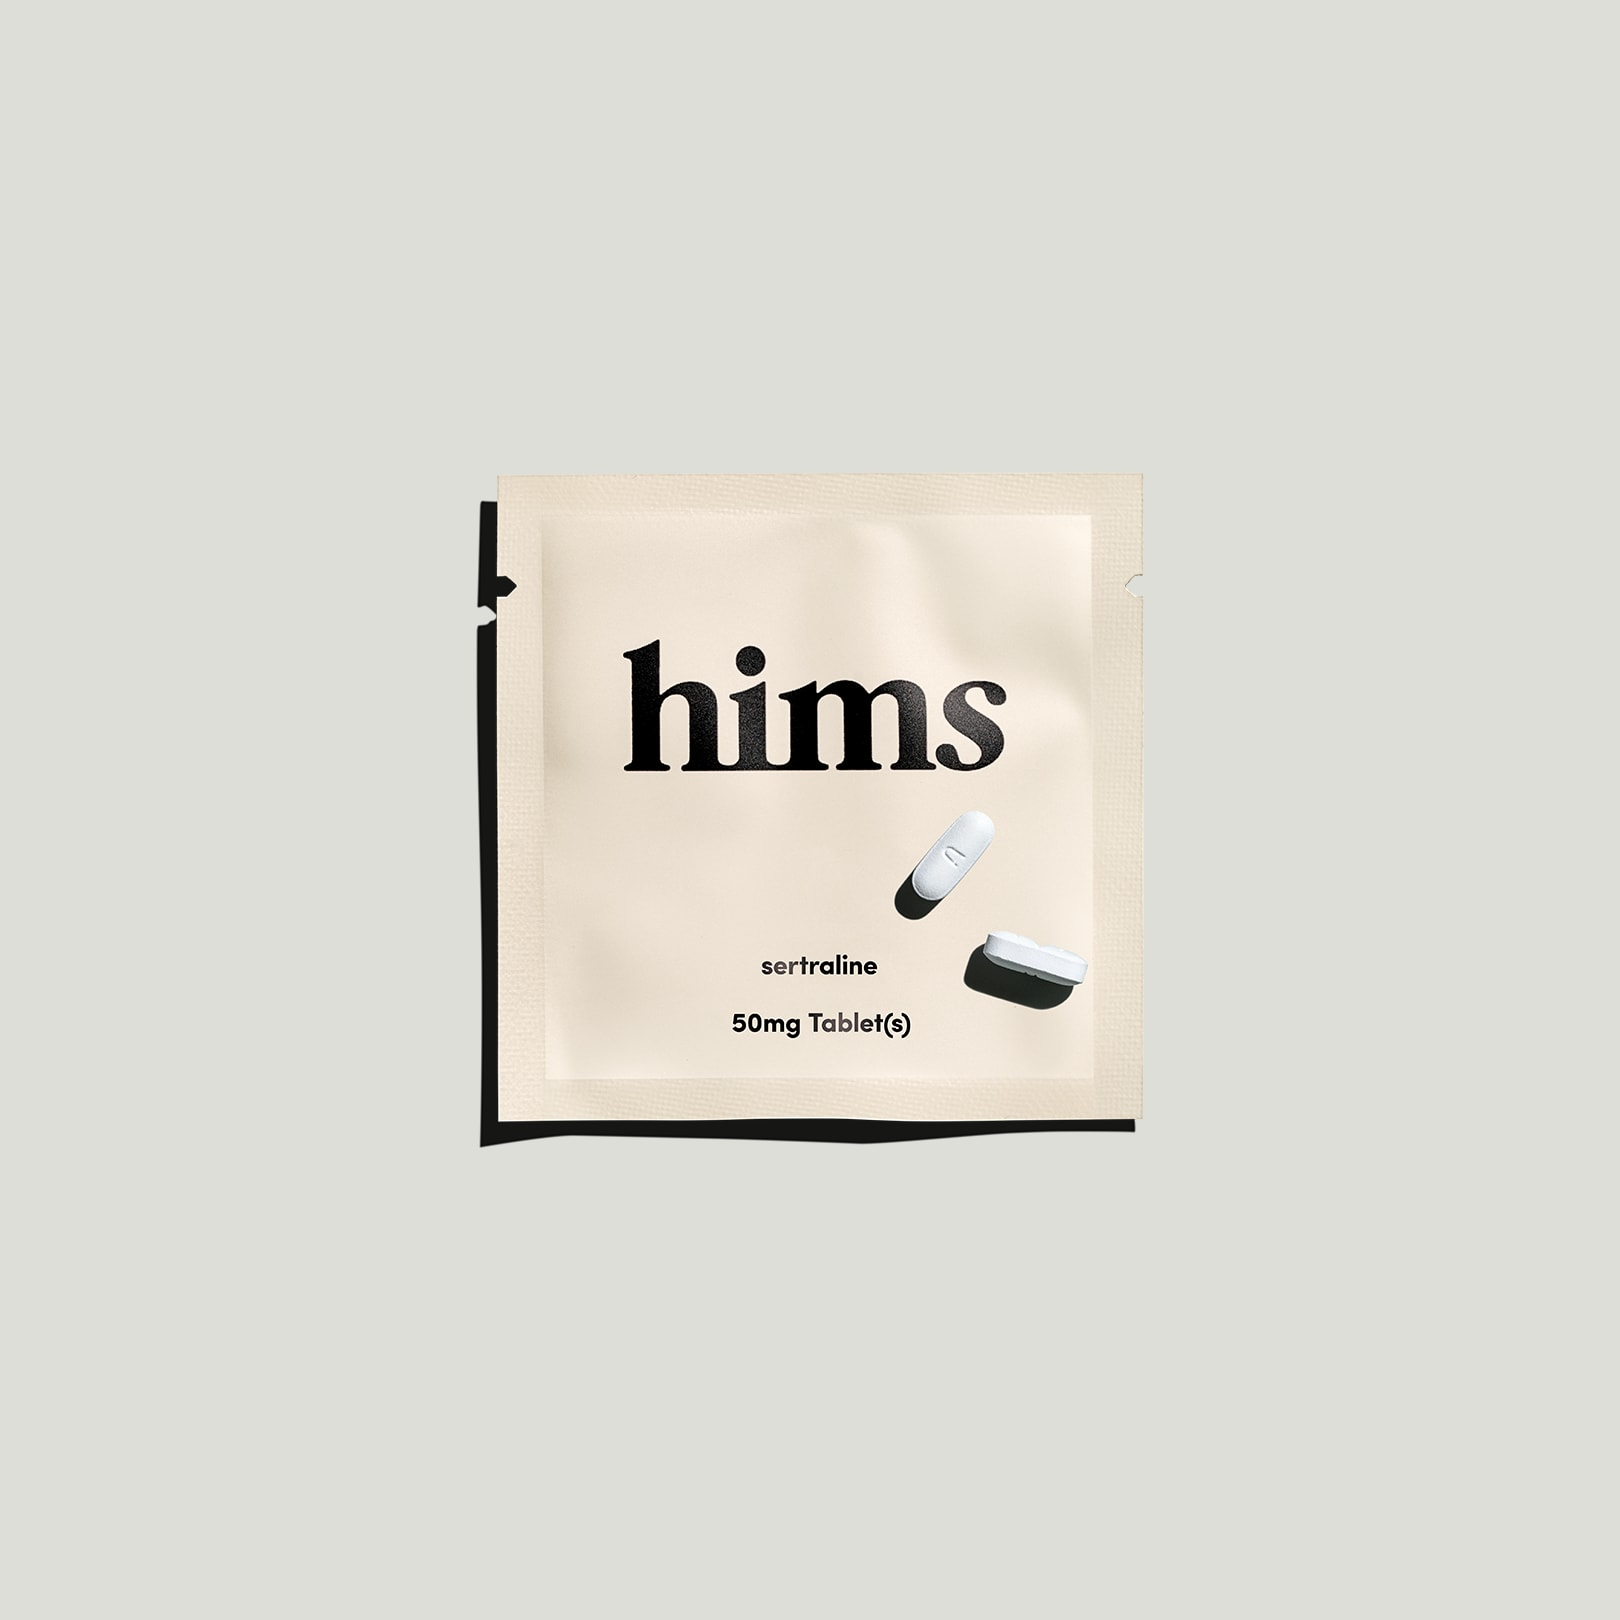 Sertraline | Hims